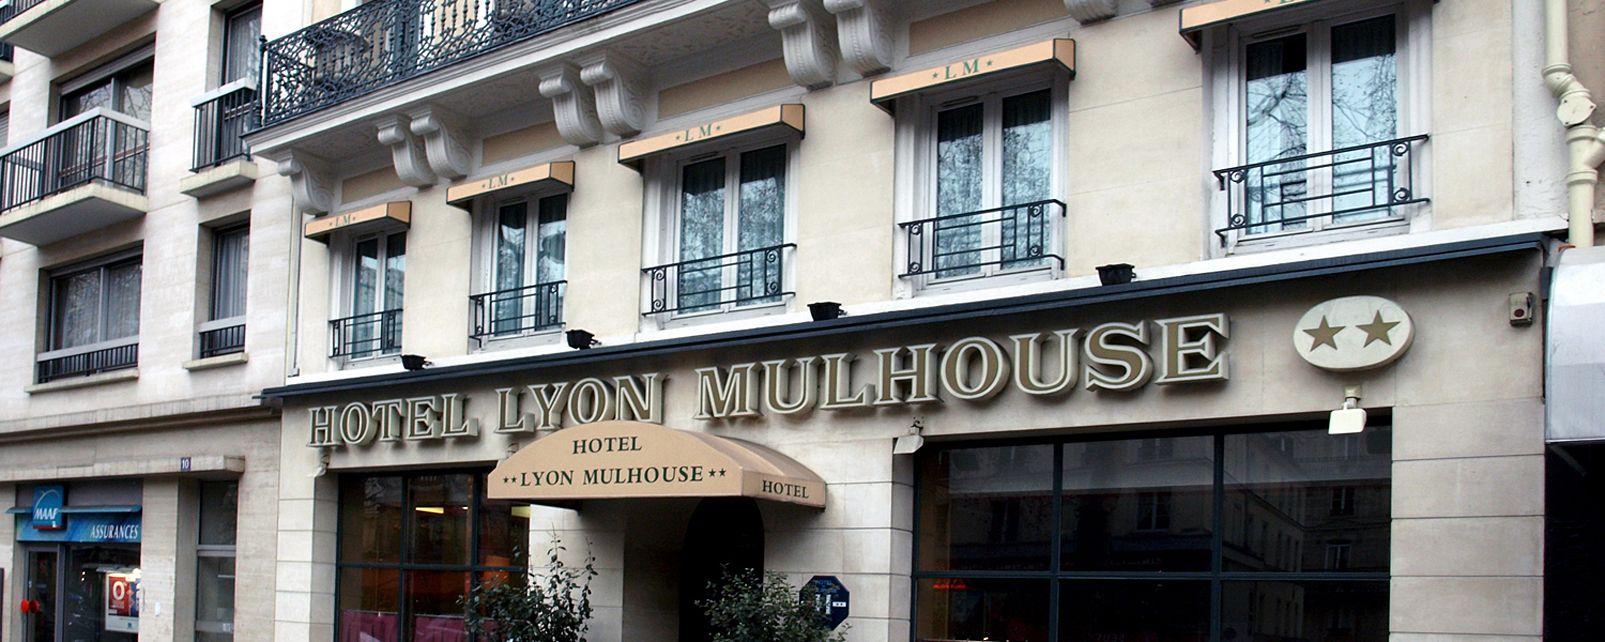 Hotel Lyon Mulhouse Bastille